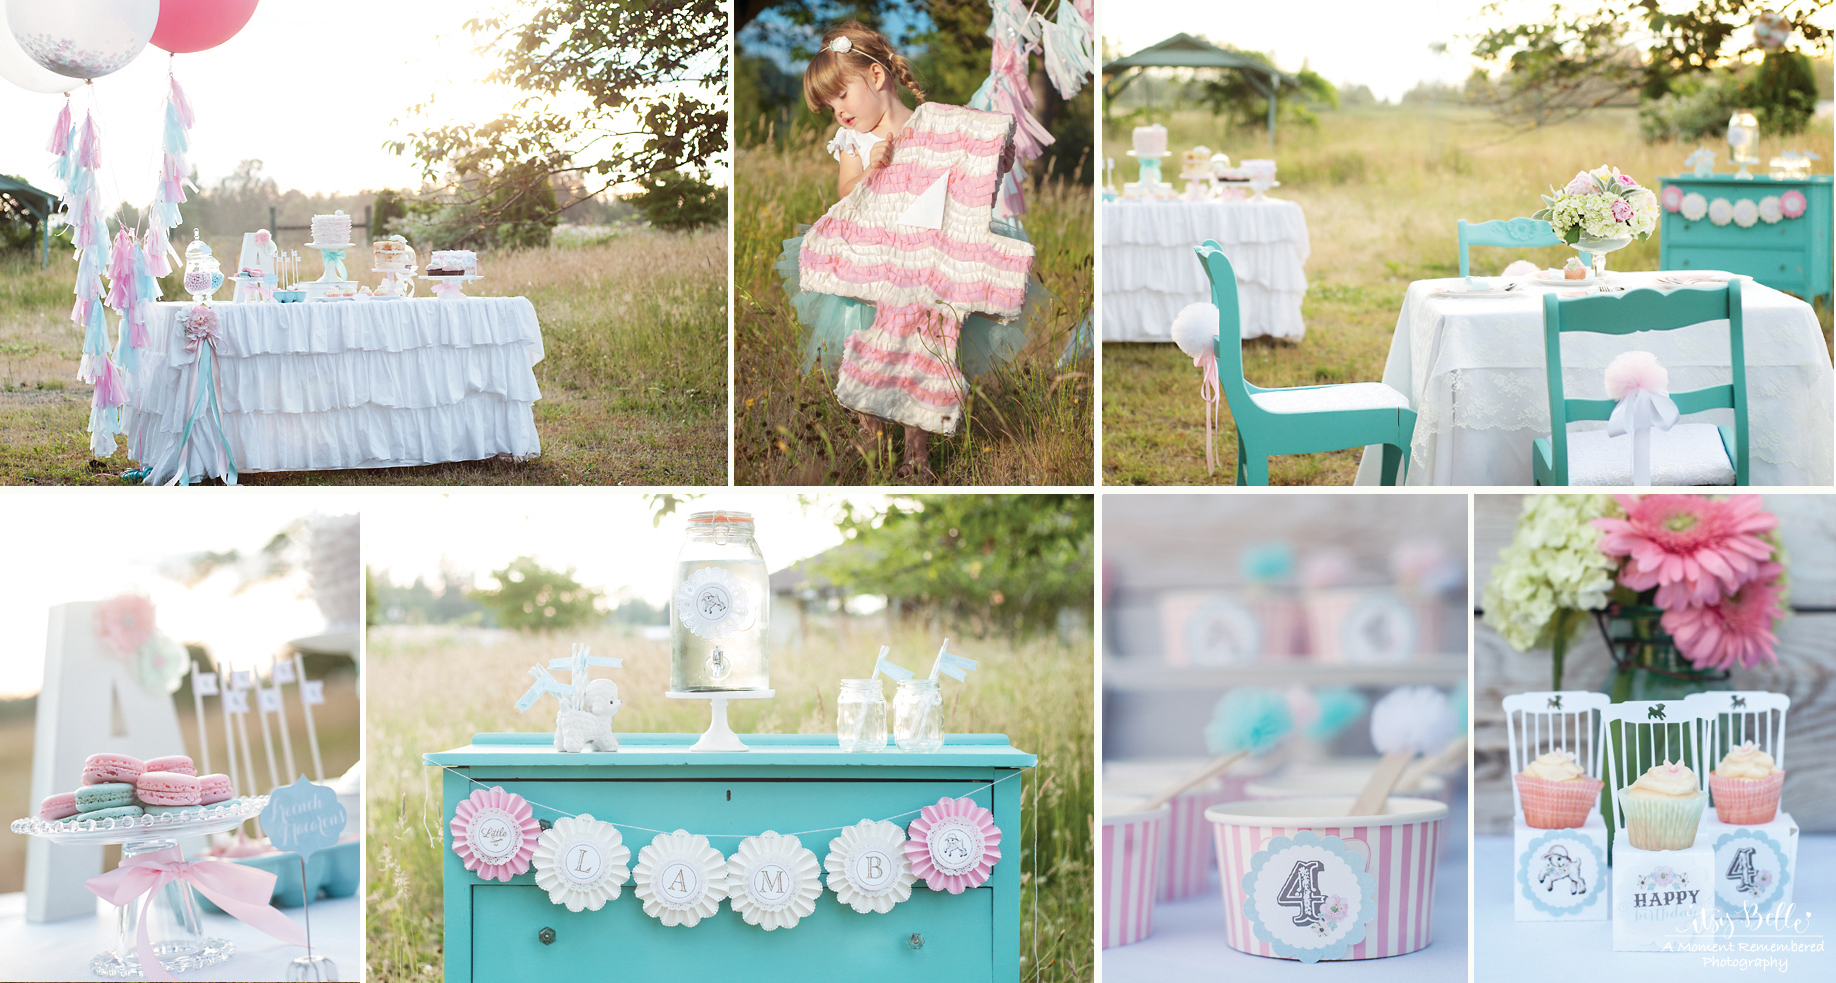 Itsy Belles Little Lamb Vintage Birthday Party Girls Birthdsay Ideas